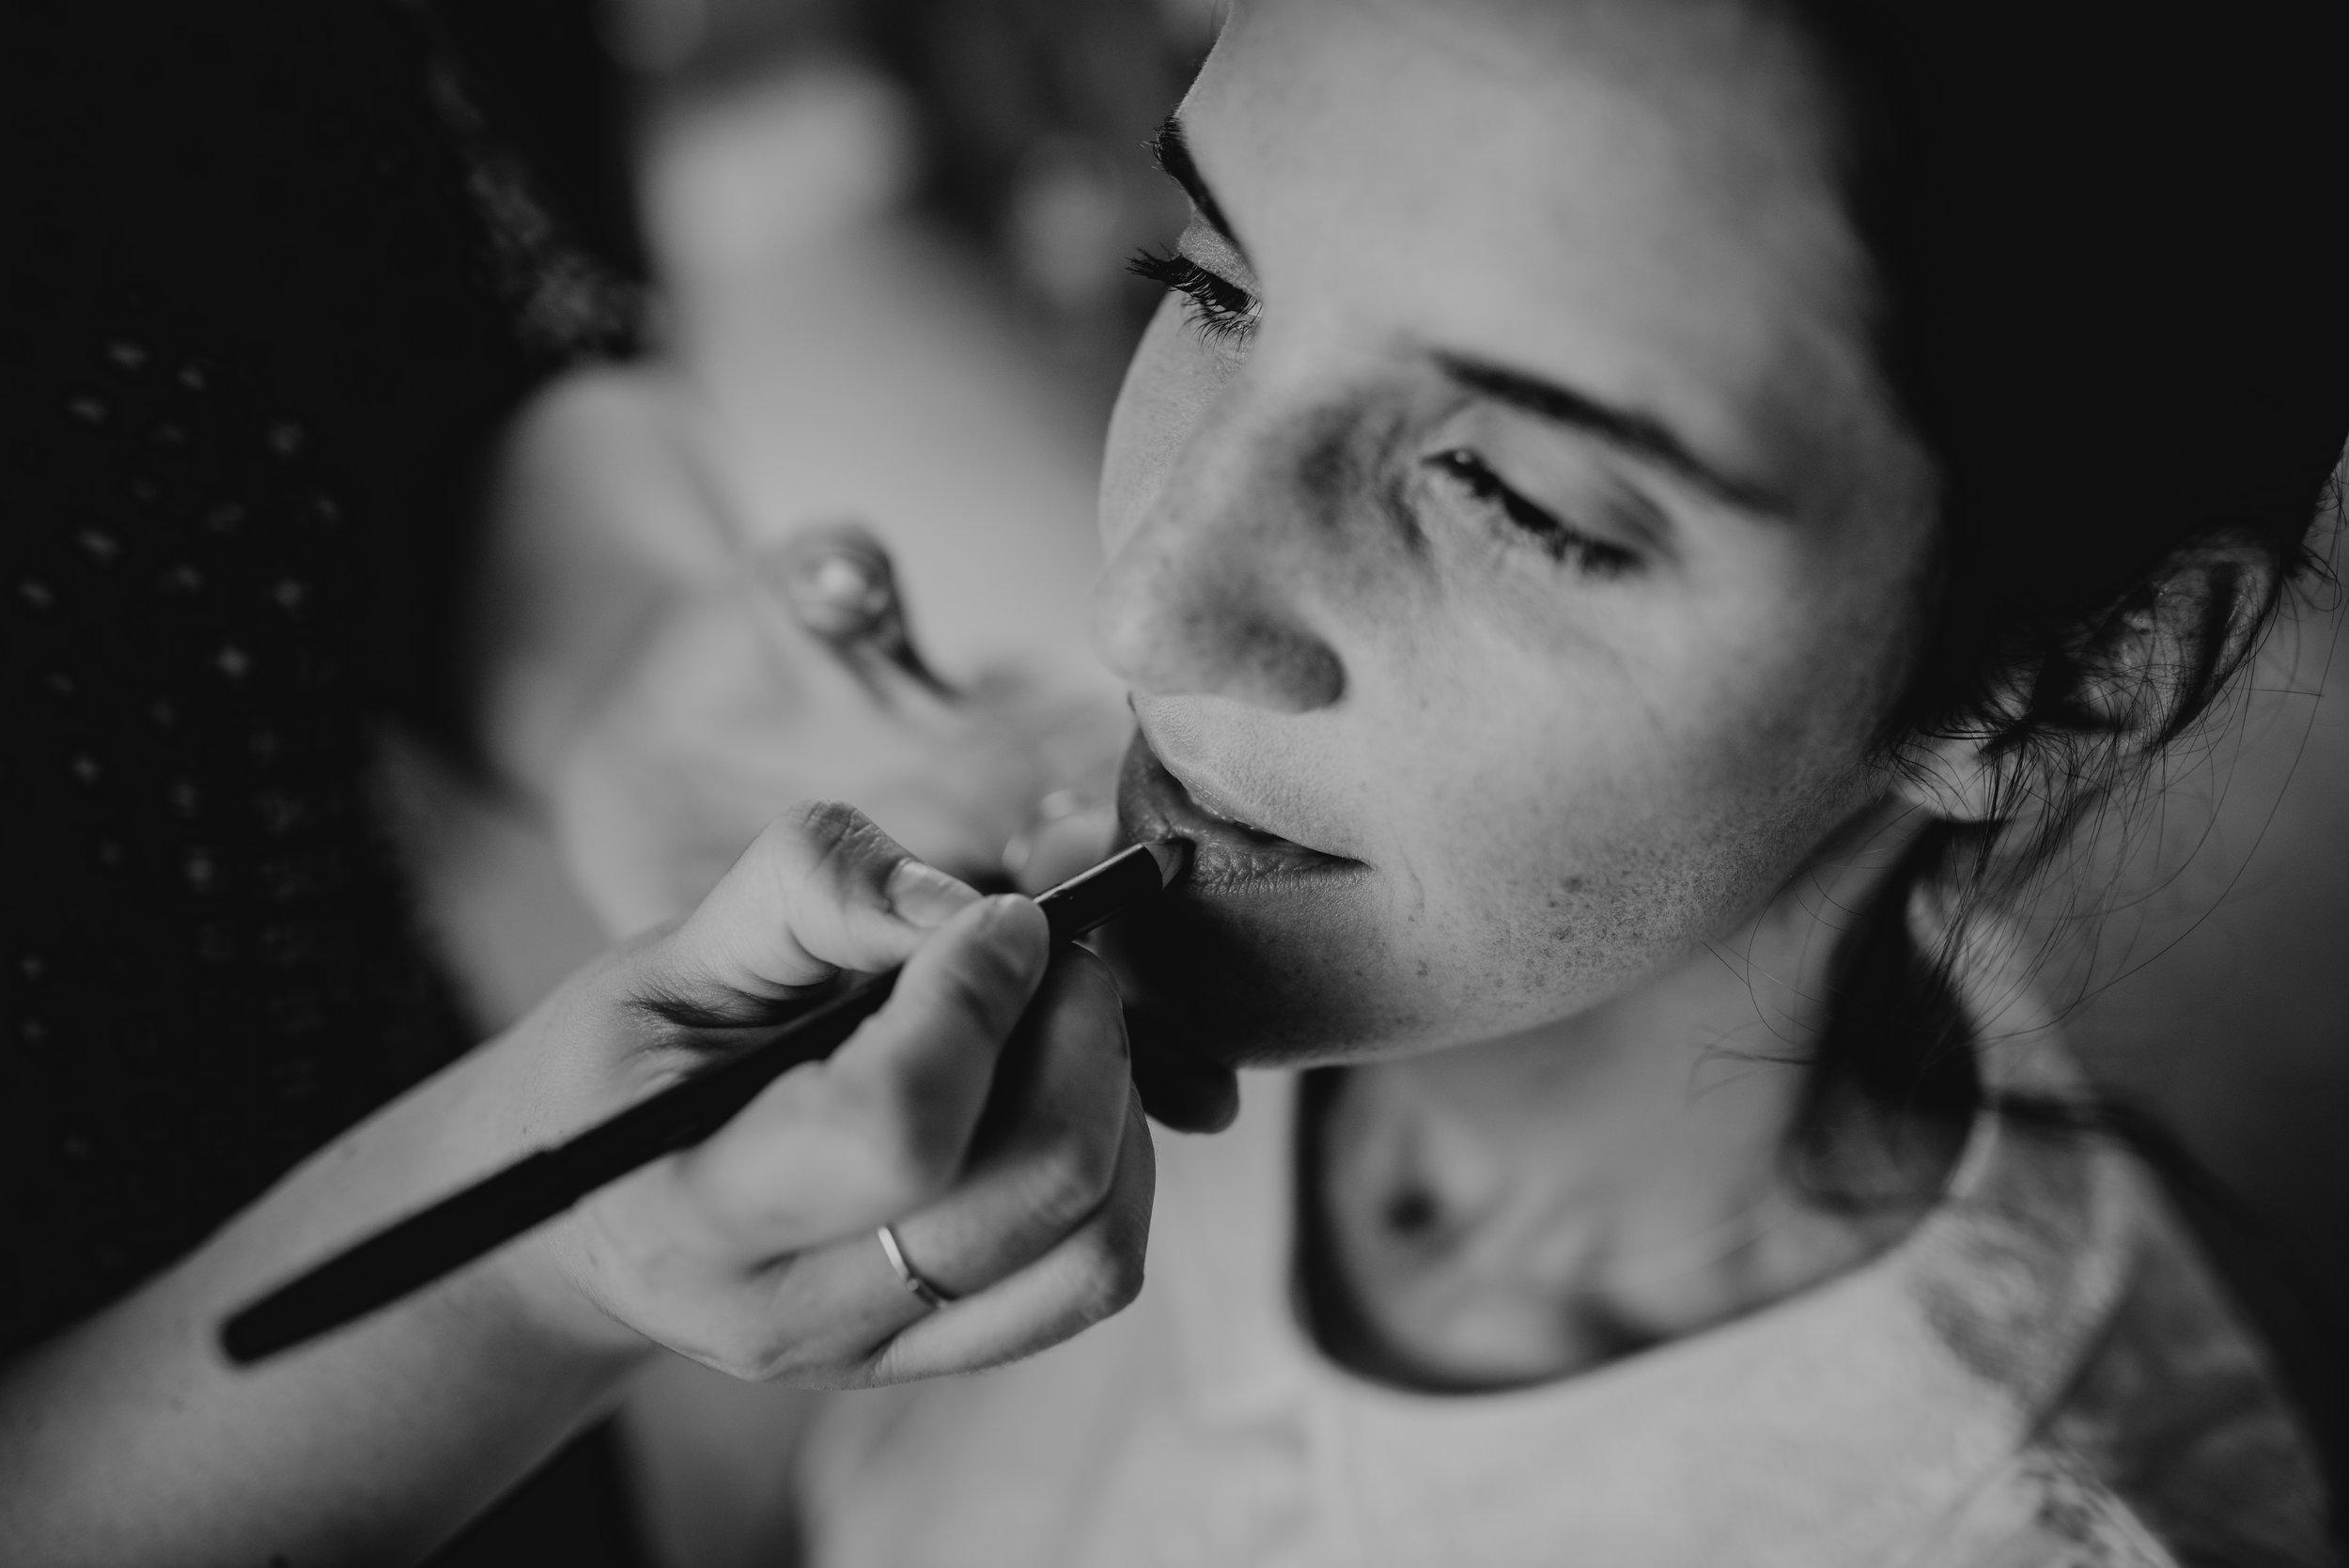 Lapela-photography-wedding-sintra-portugal-4.jpg